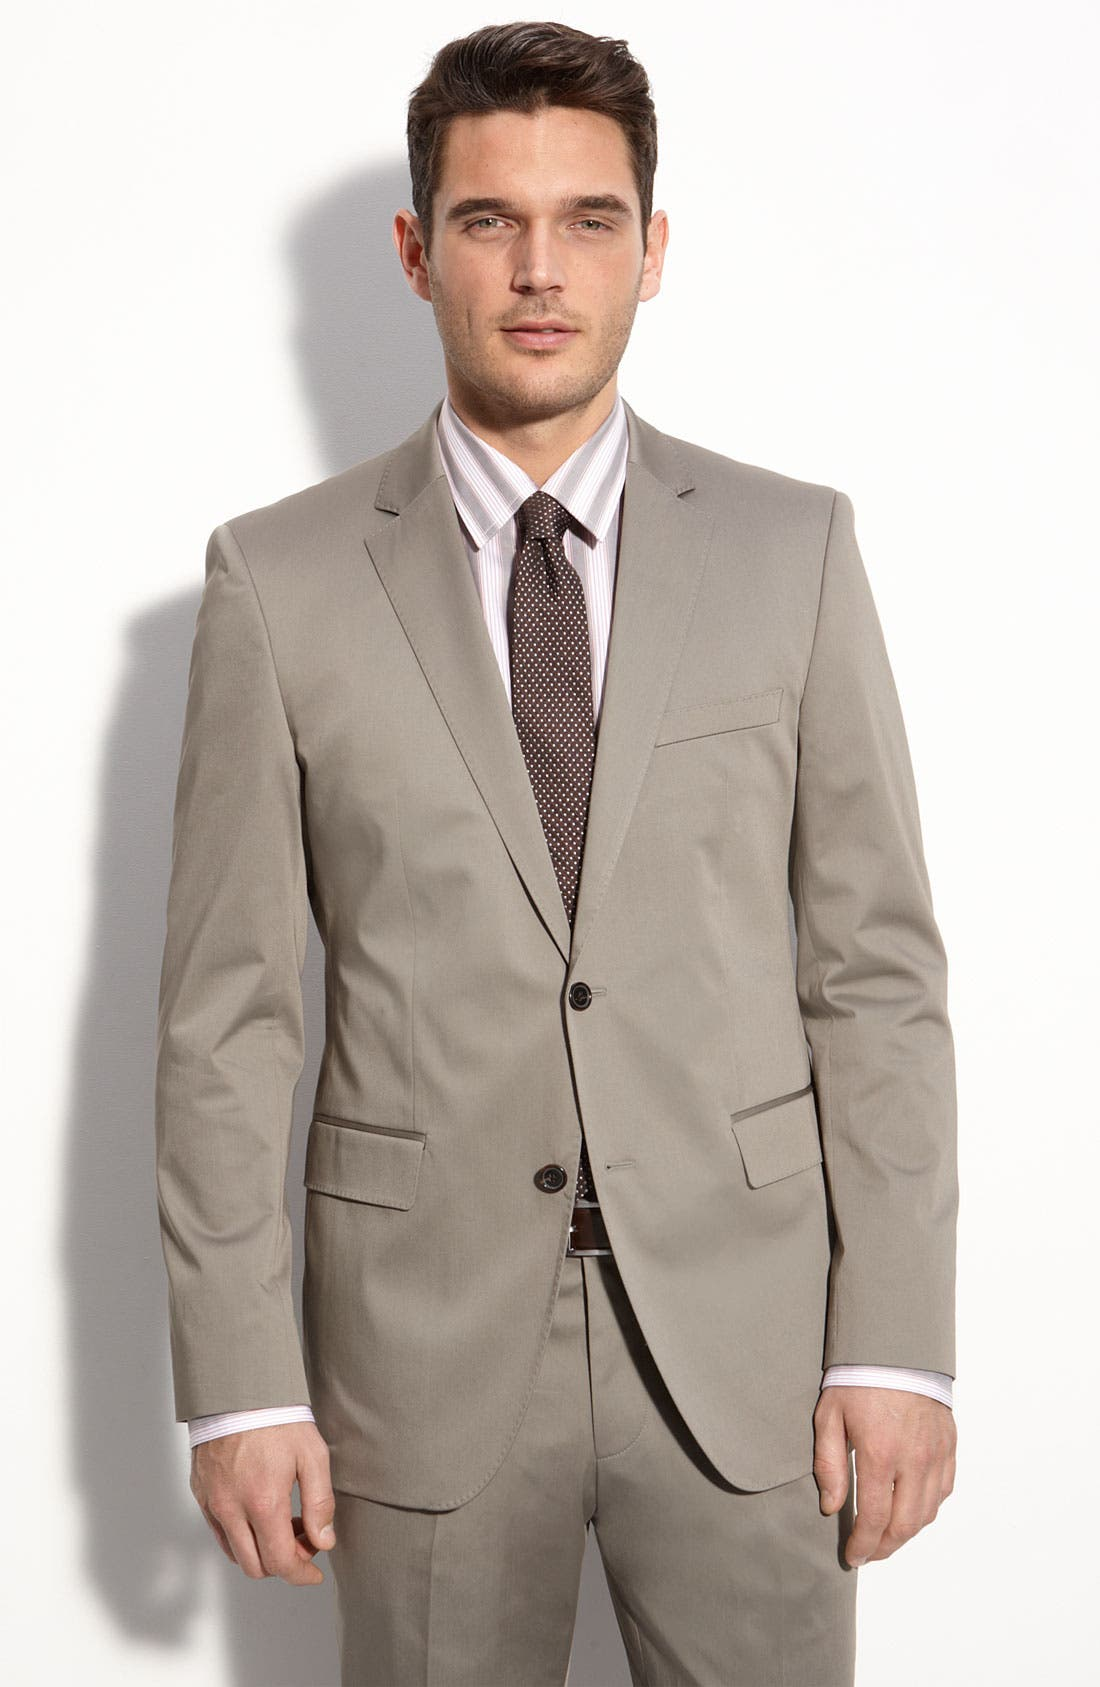 BOSS Black 'The James/Sharp 2' Grey Stretch Cotton Suit,                             Main thumbnail 1, color,                             031